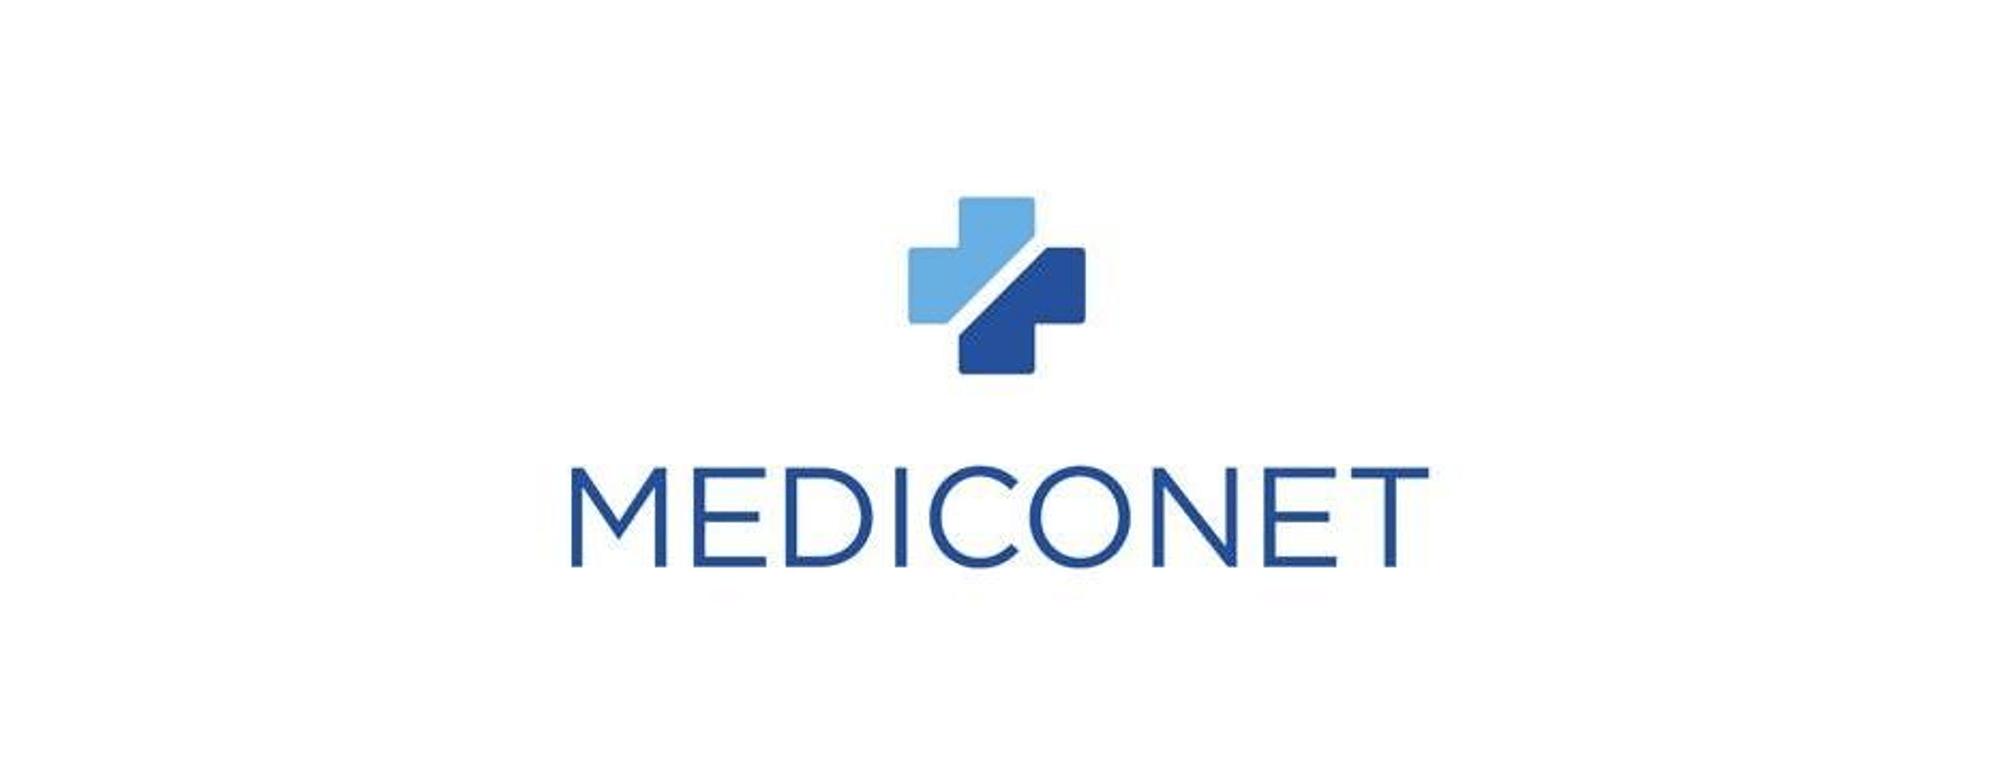 klient-wooacademy-mediconet-logo